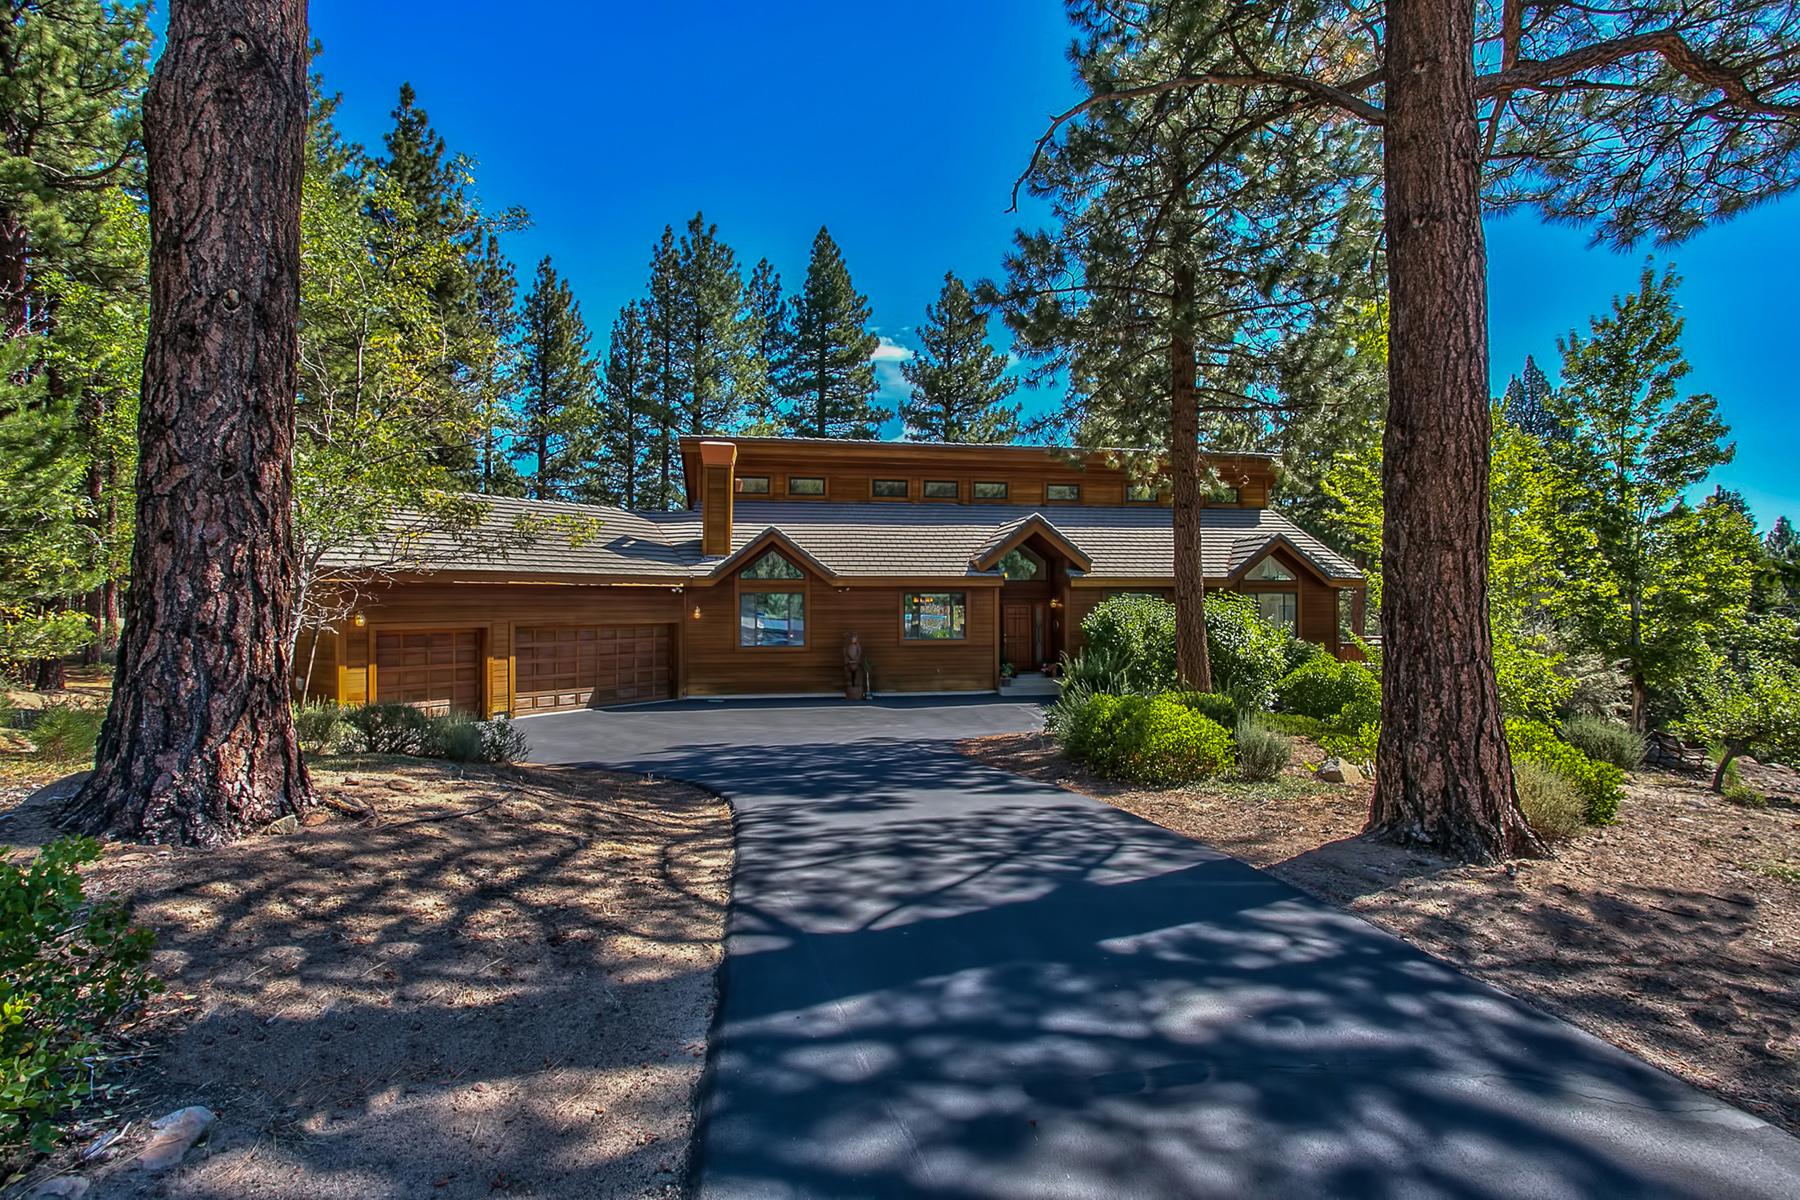 Single Family Home for Active at 1155 Joy Lake Road Reno, Nevada 89511 United States